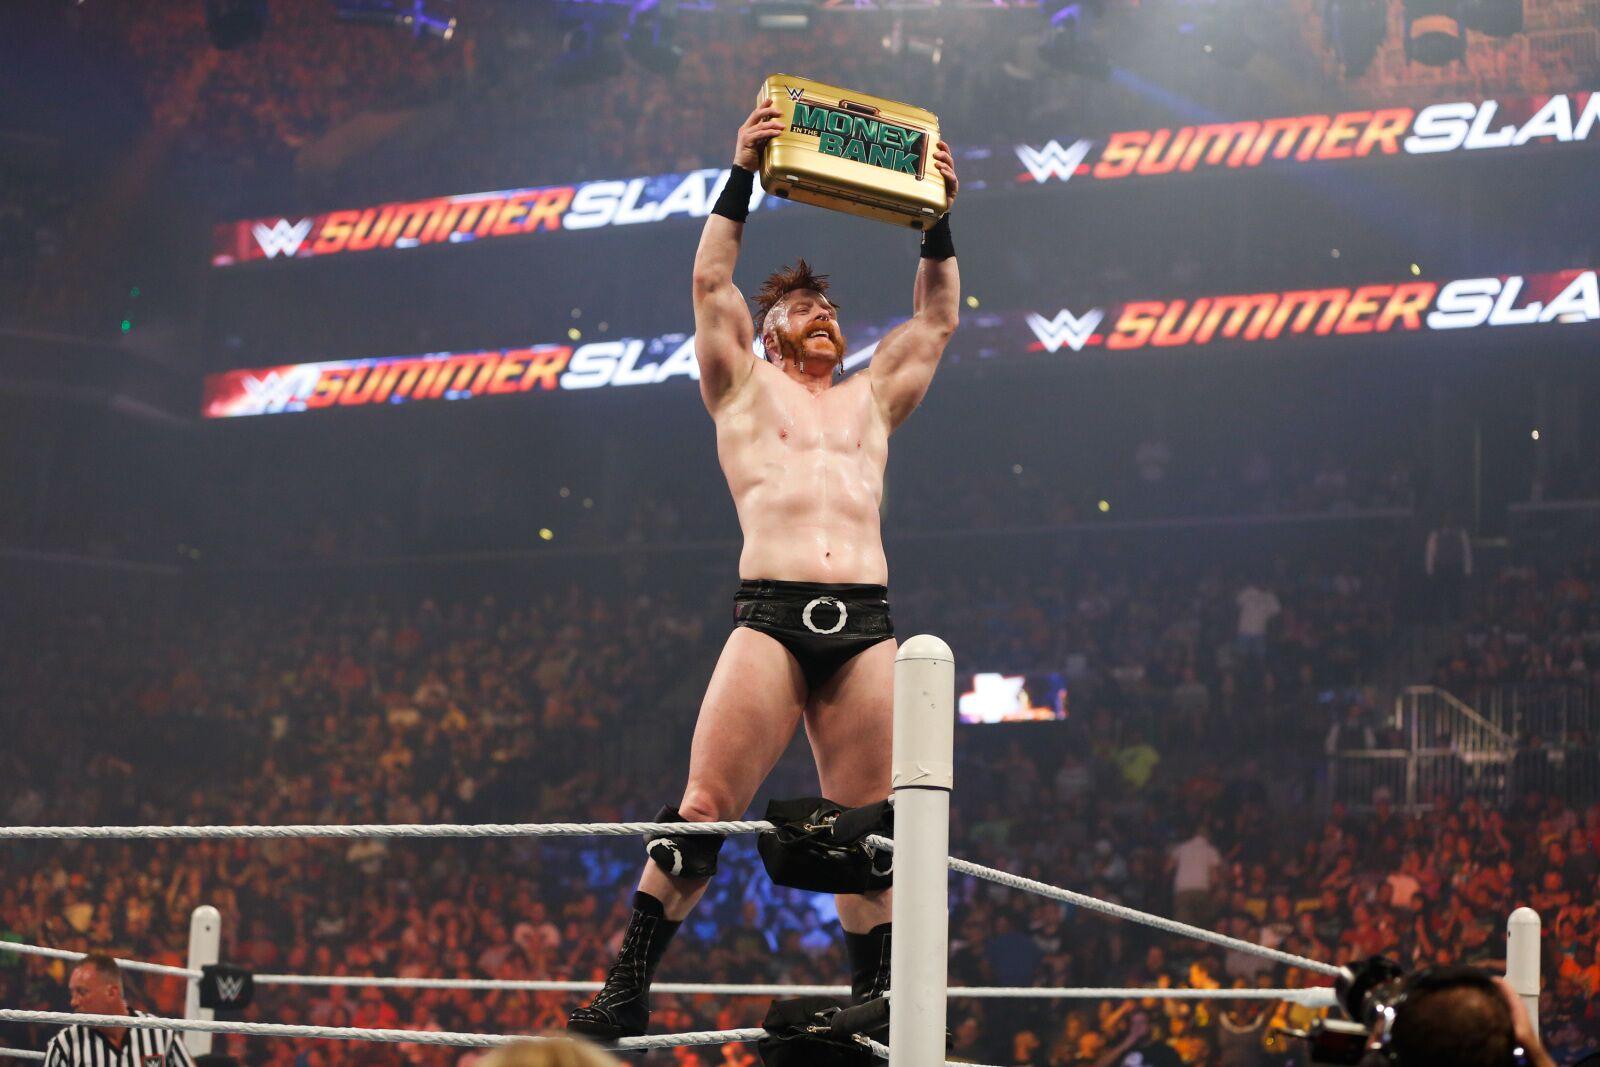 WWE Smackdown Live: Is Sheamus making a comeback soon?